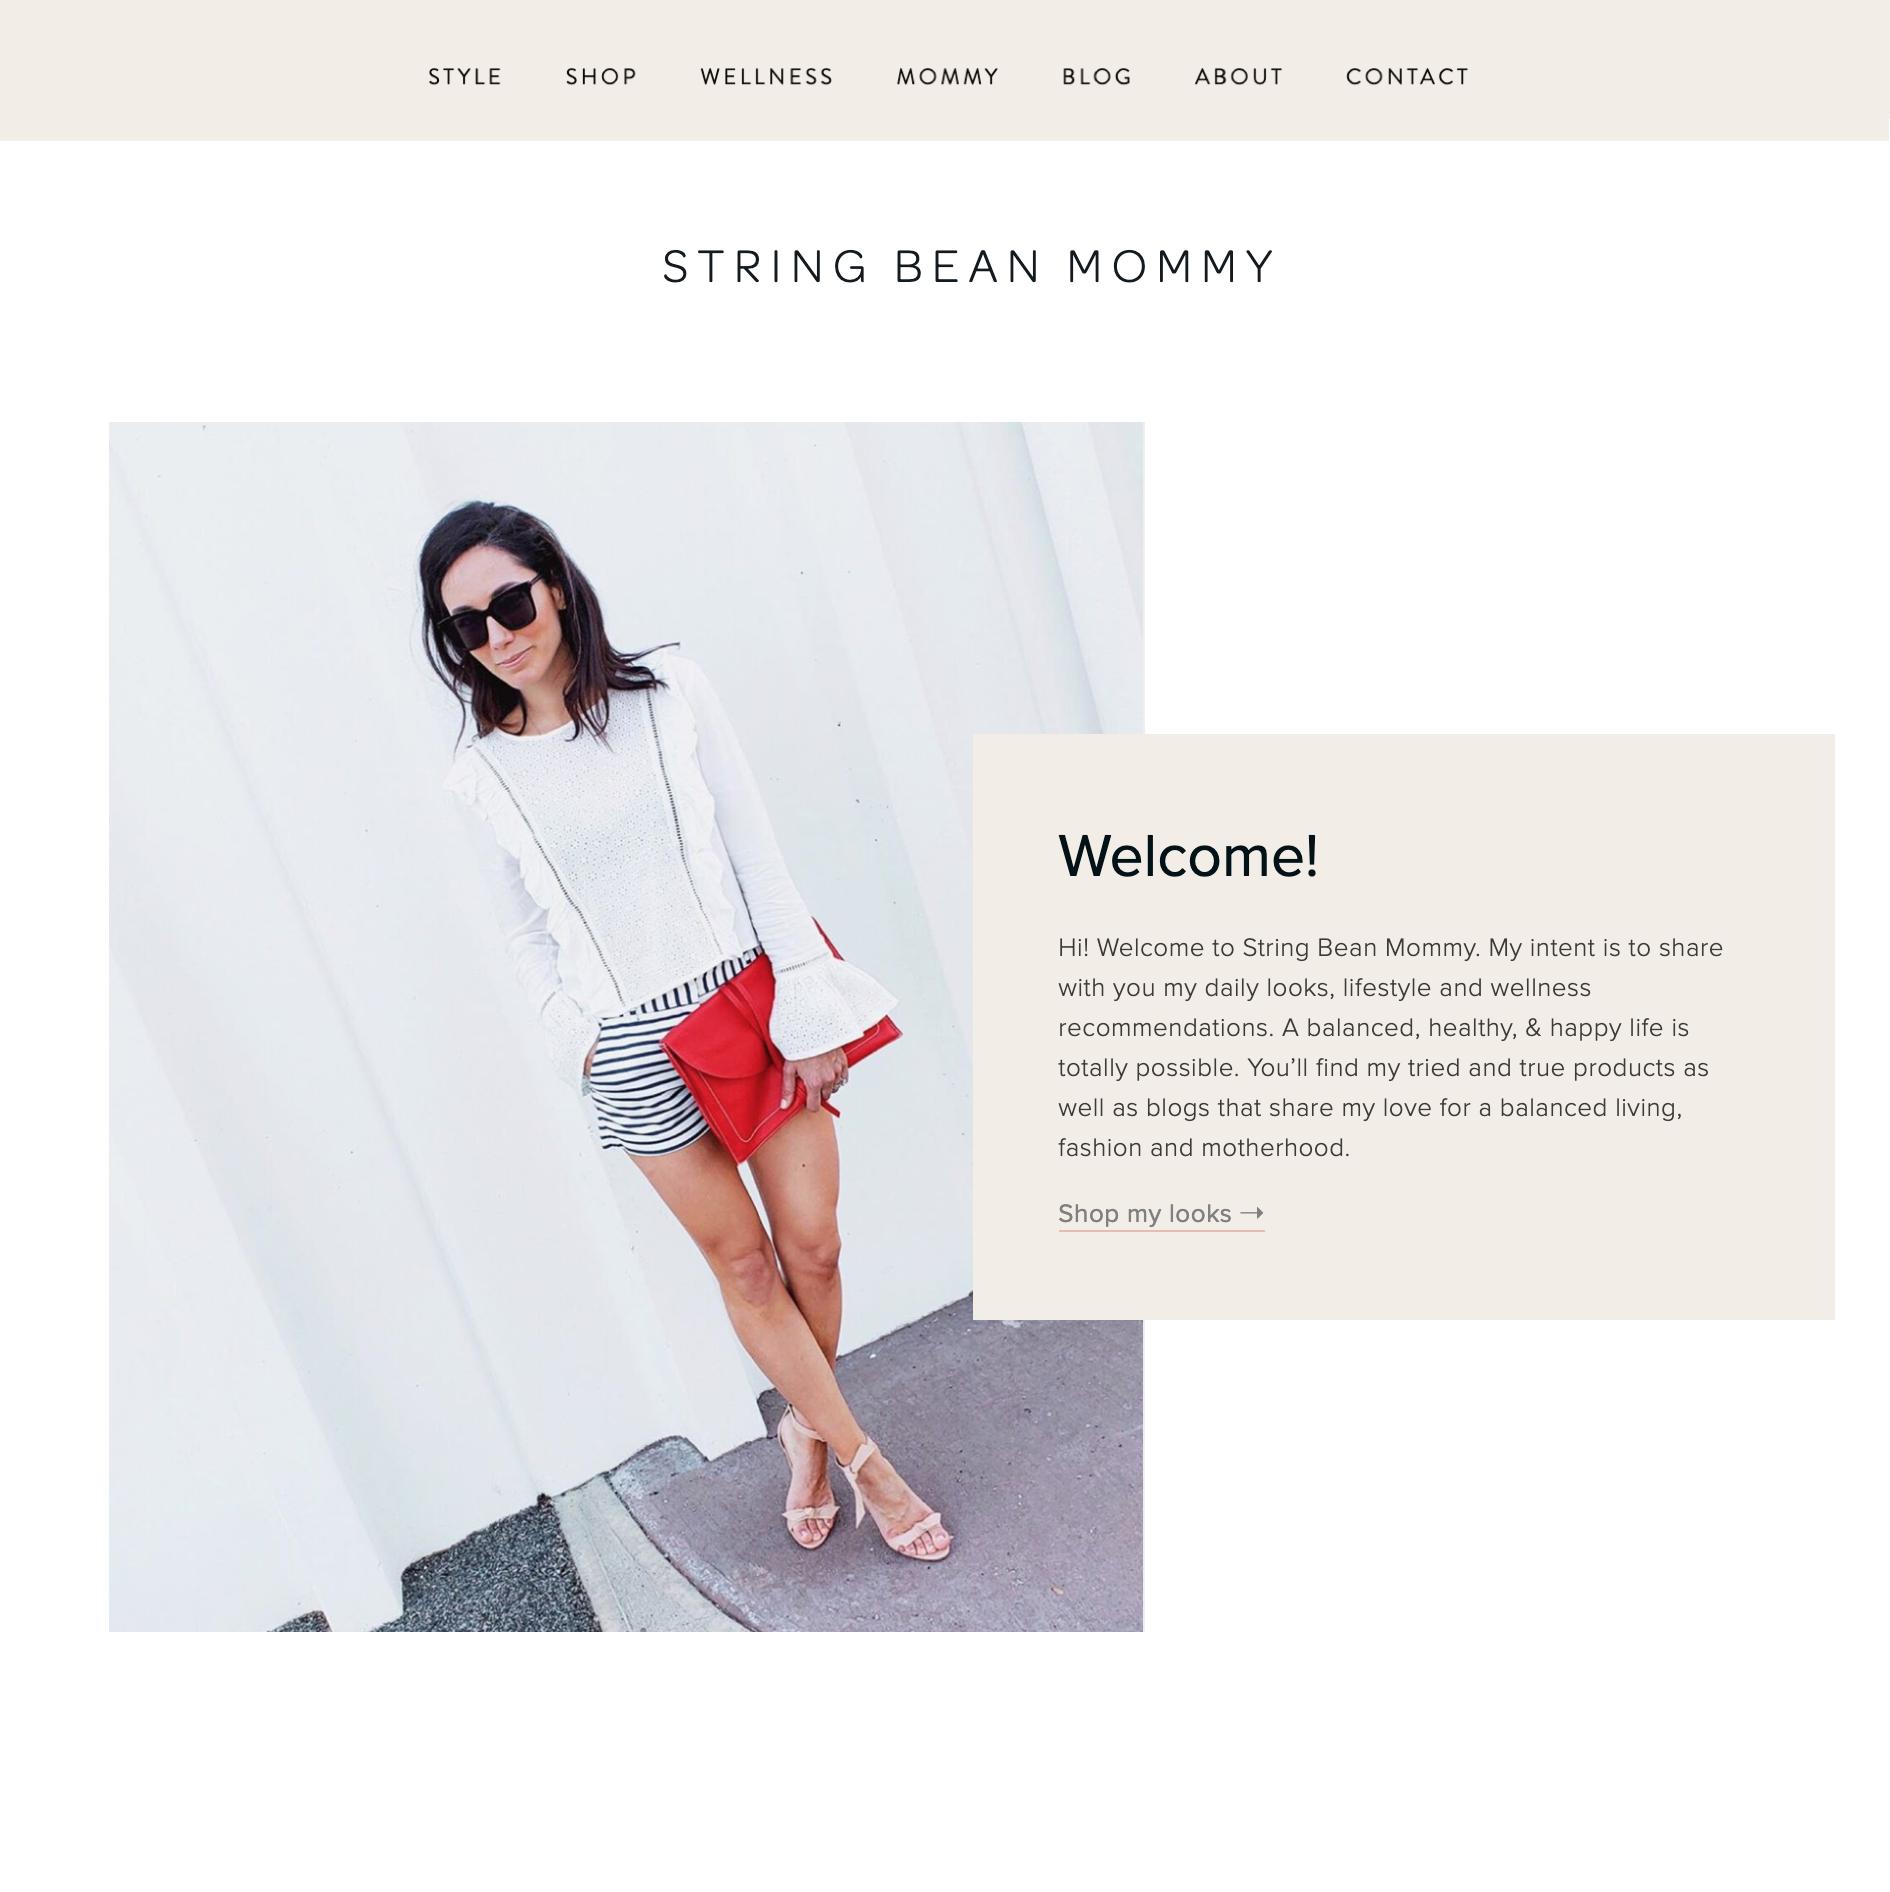 Blog site with LikeToKnowIt & RewardStyle integration